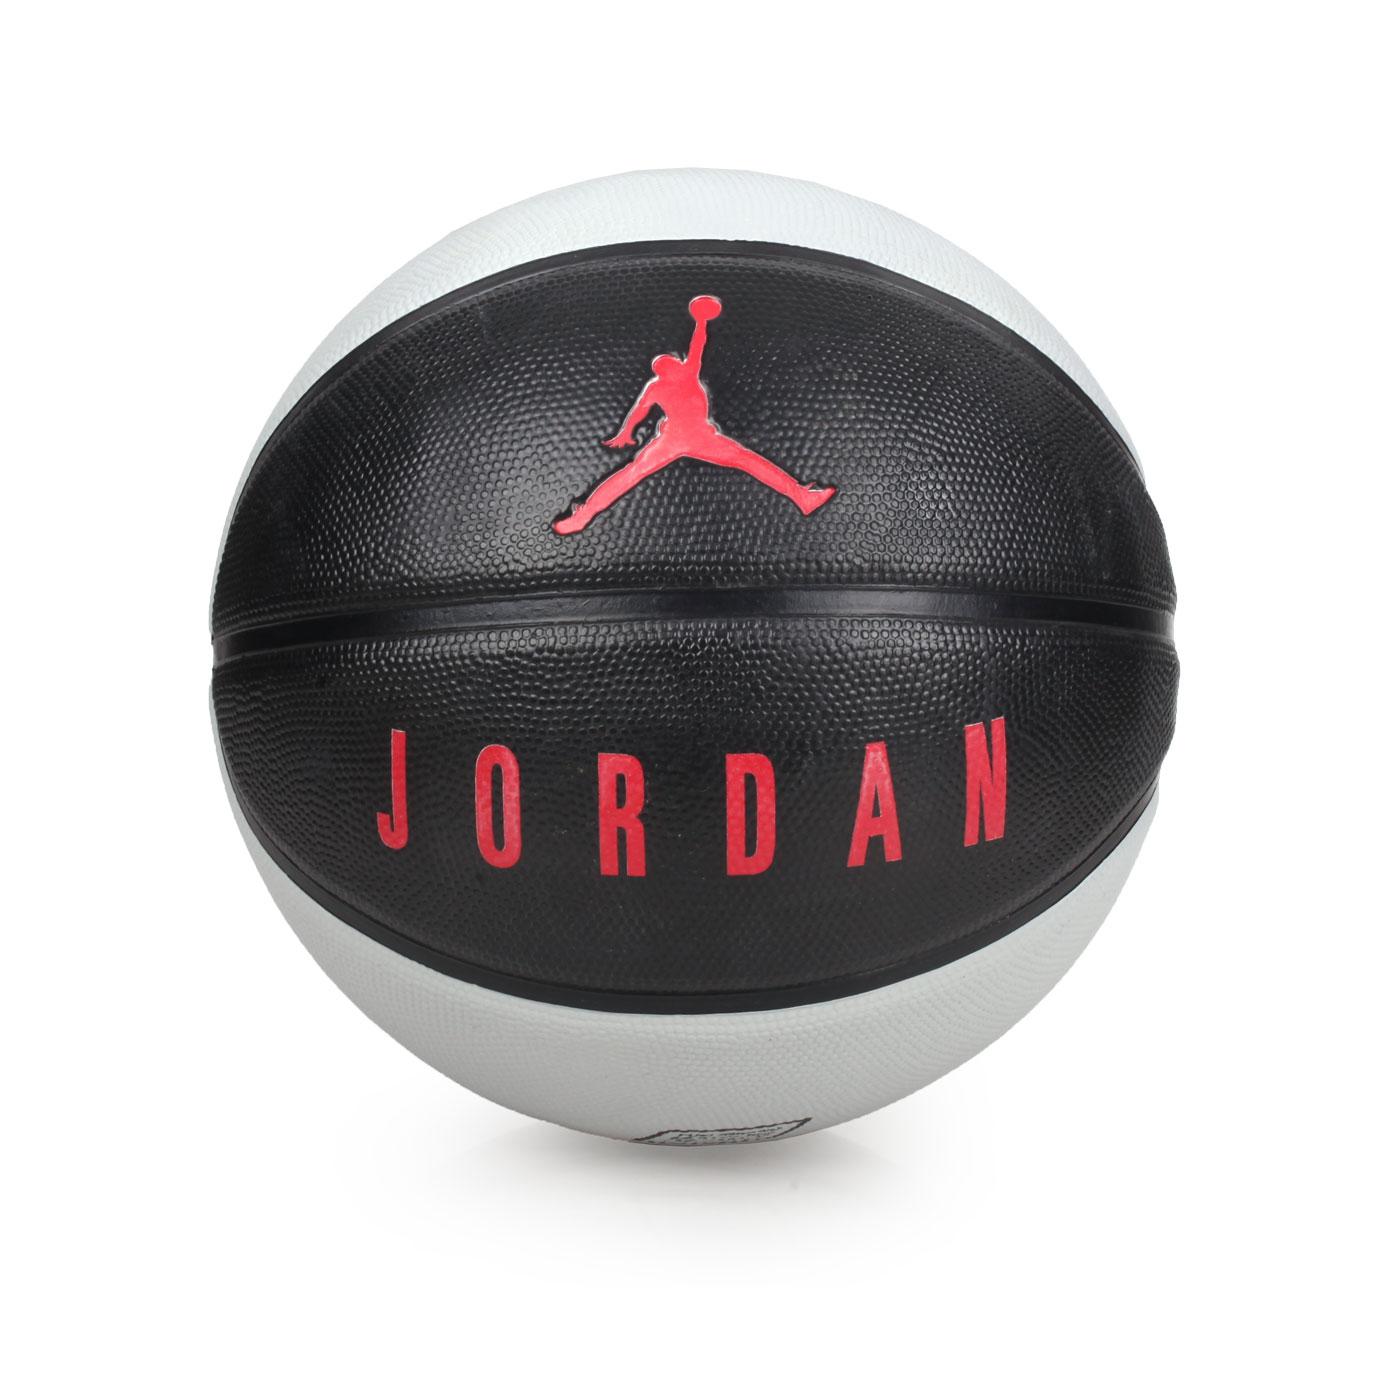 NIKE JORDAN PLAYGROUND 8P 7號籃球 J000186504107 - 黑灰紅